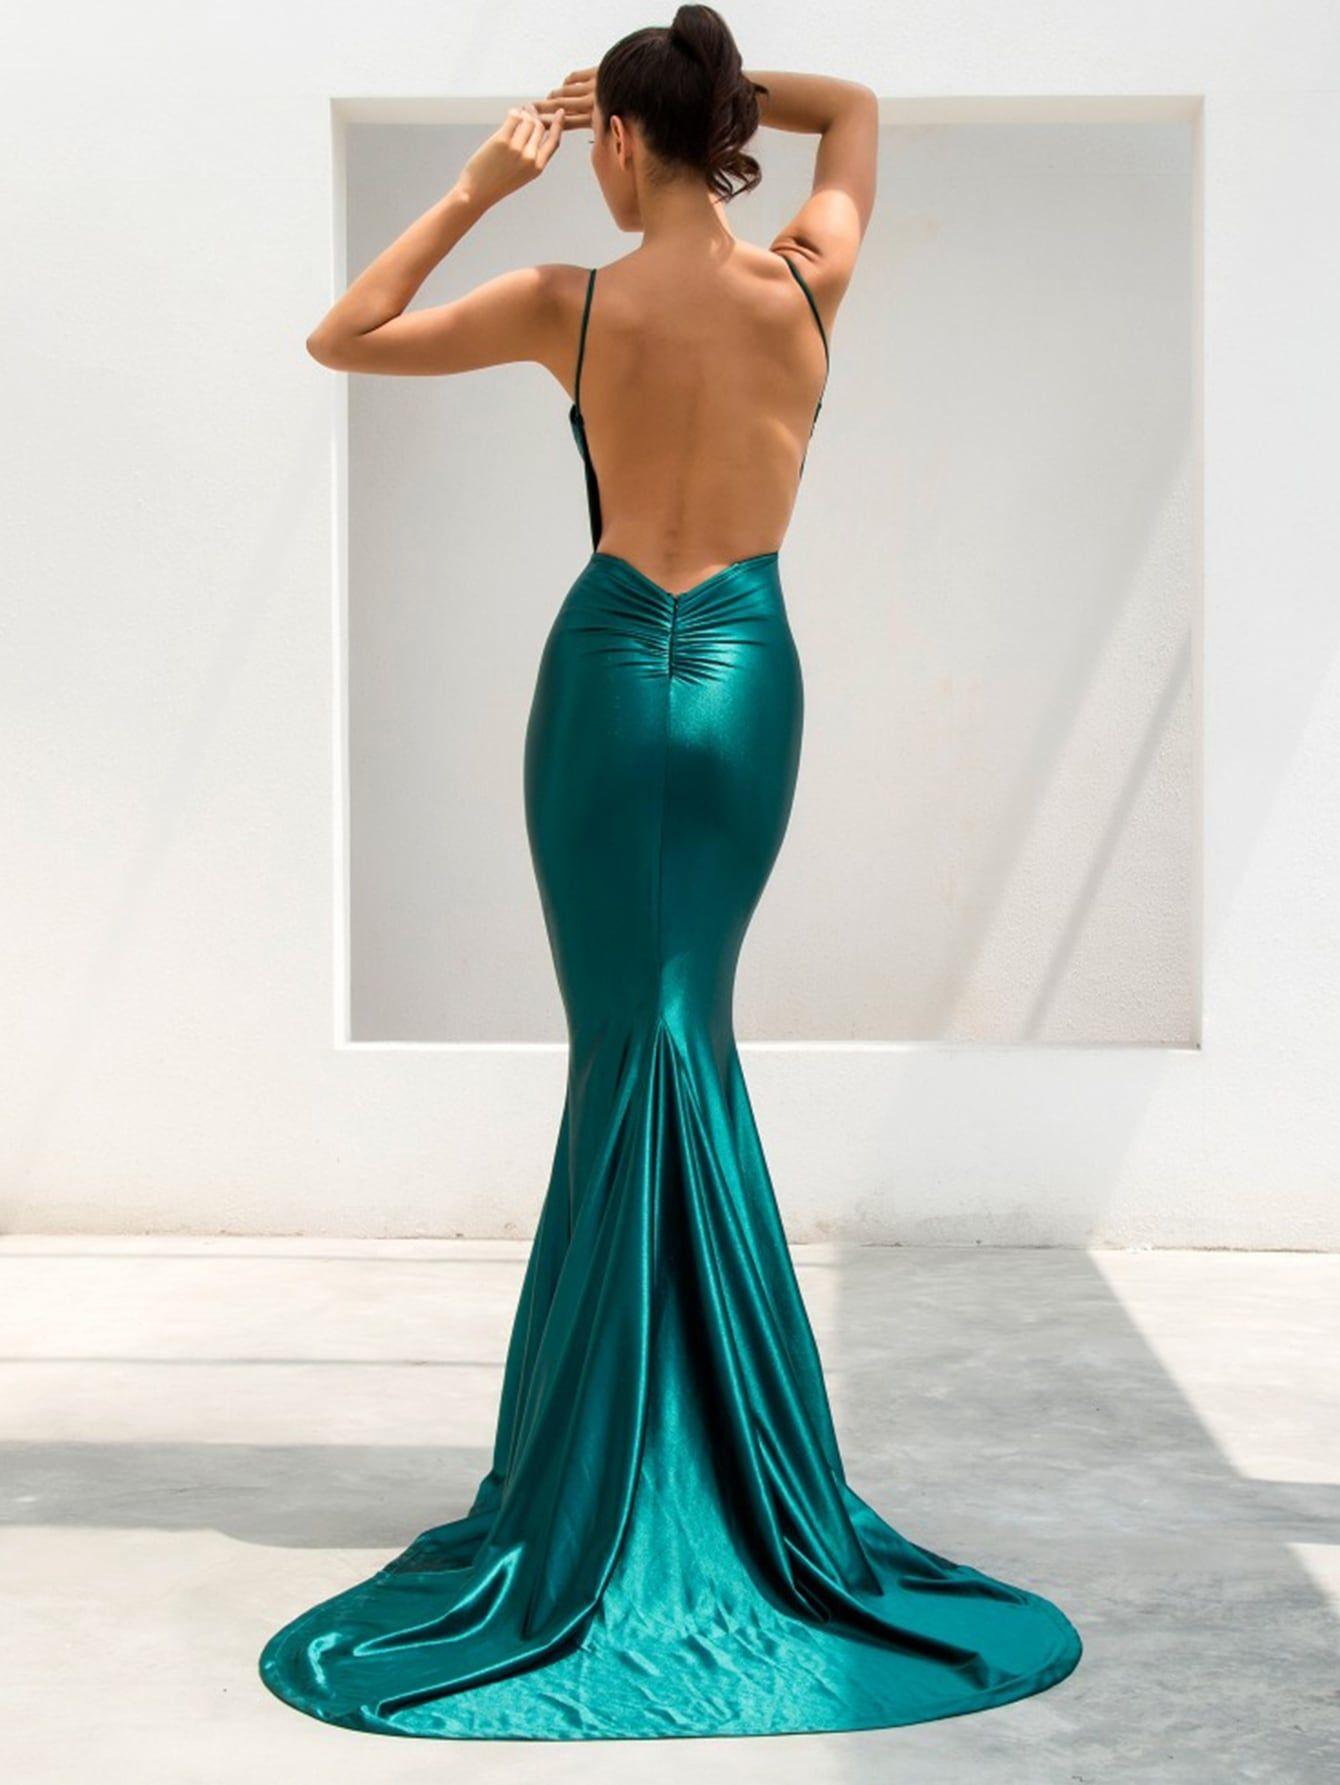 Backless Fishtail Hem Satin Cami Prom Dress In 2021 Green Evening Gowns Emerald Green Evening Gown Gala Dresses [ 1785 x 1340 Pixel ]